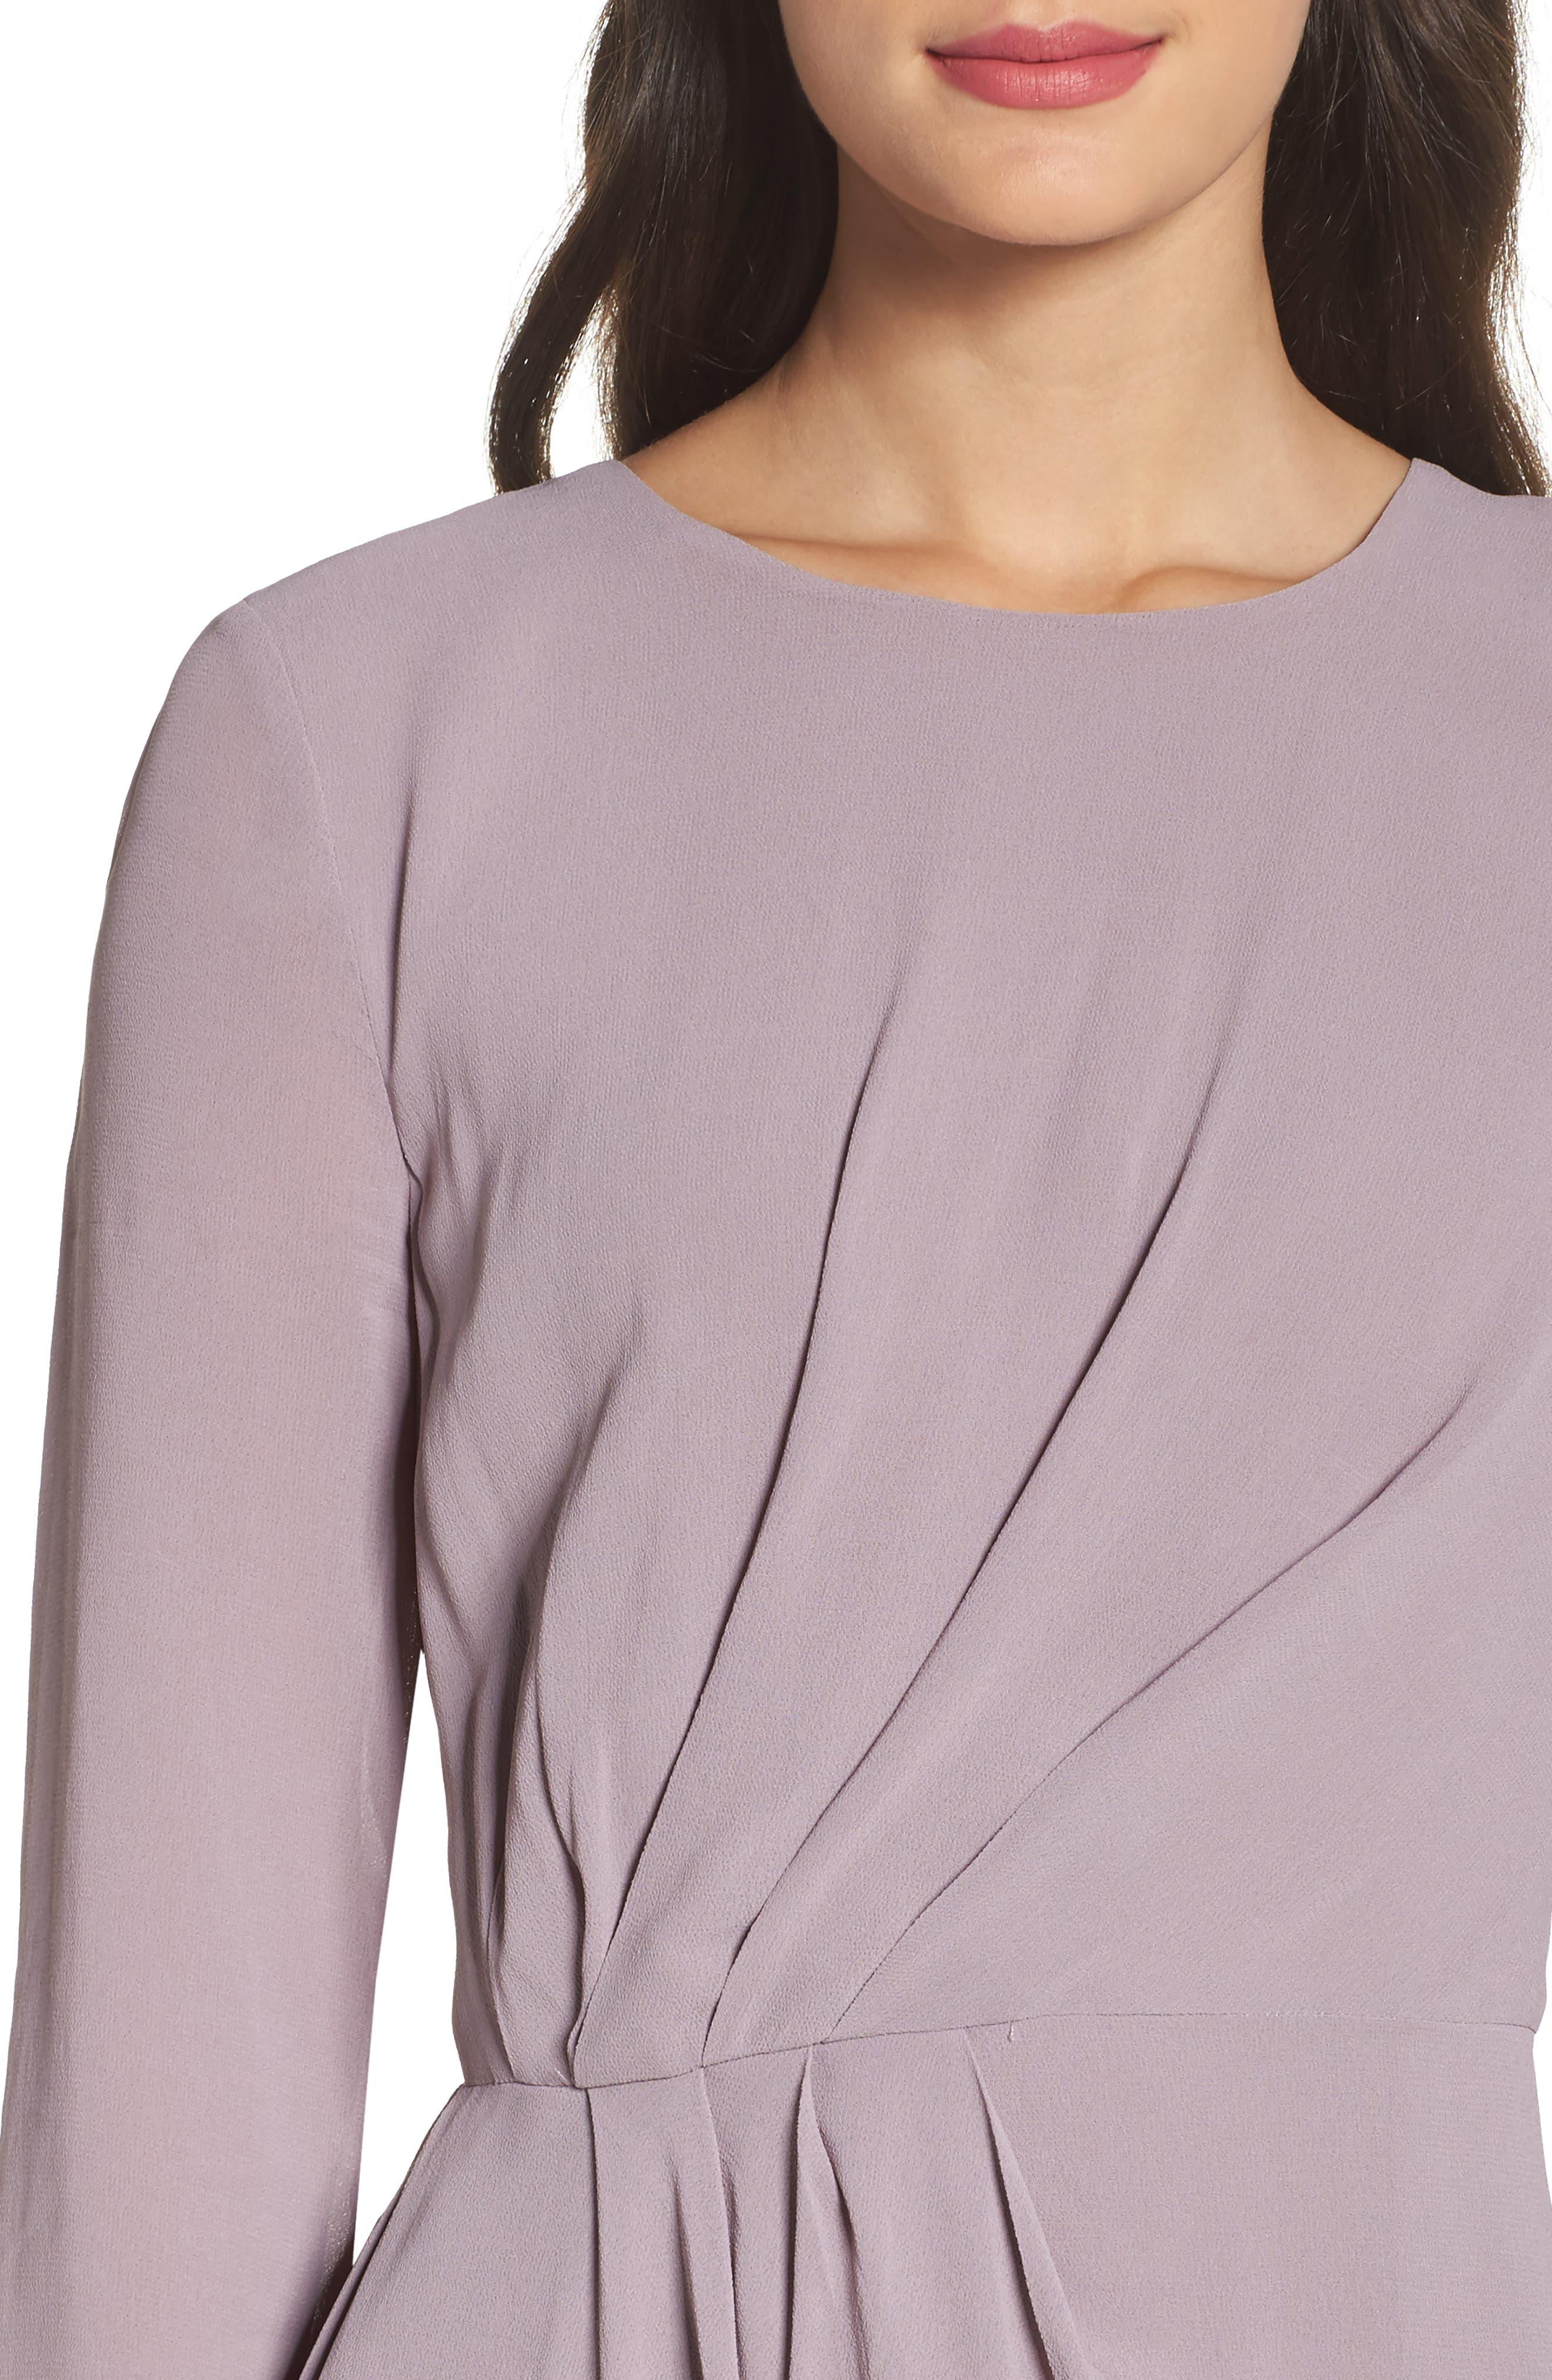 Stilla Asymmetric Drape Dress,                             Alternate thumbnail 4, color,                             535